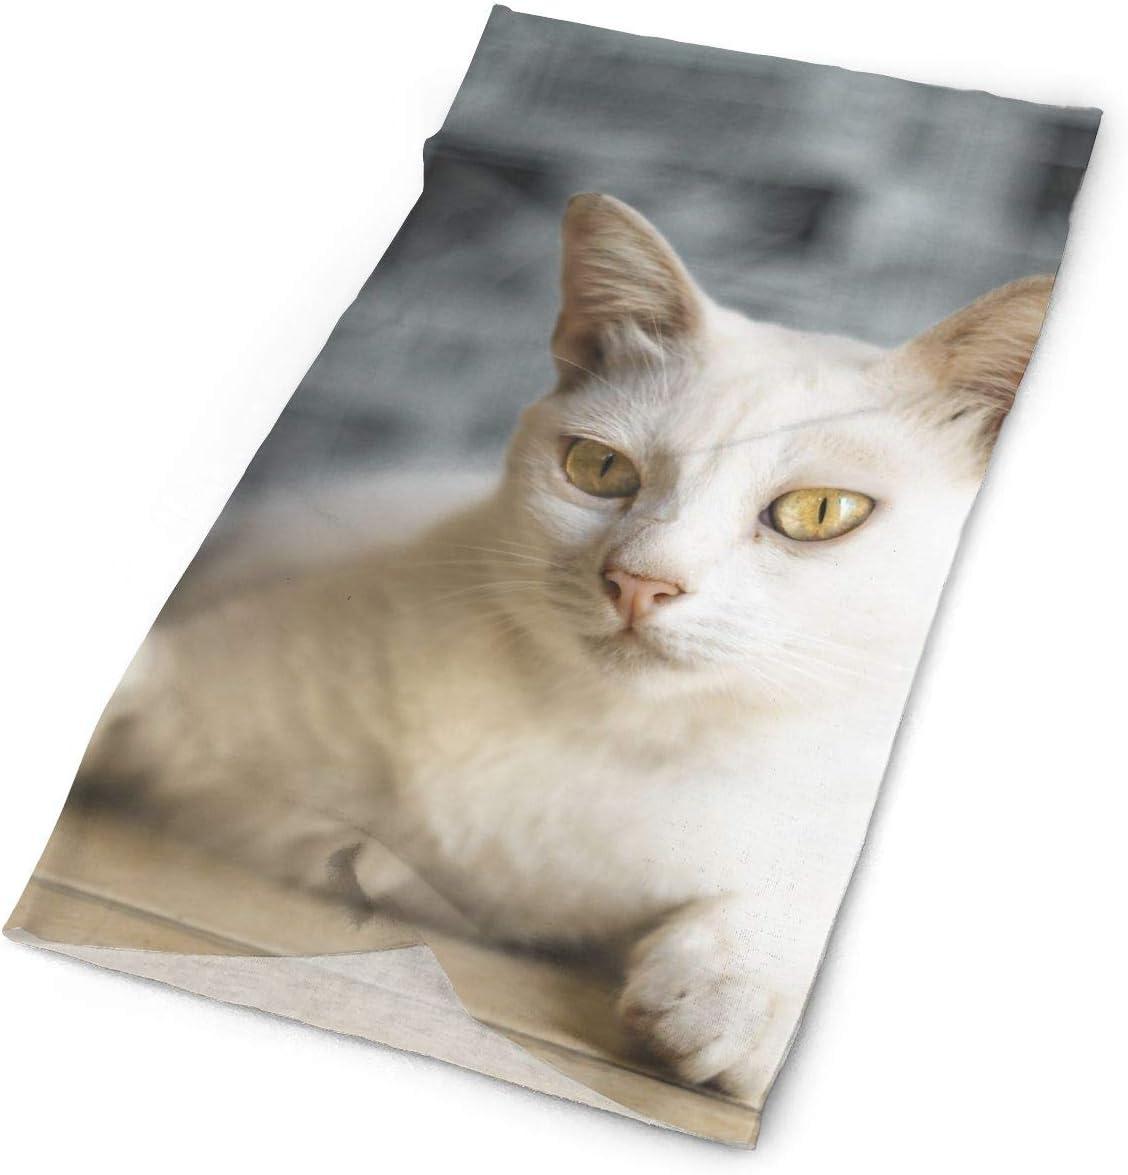 White Cat Glare Unisex Fashion Quick-Drying Microfiber Headdress Outdoor Magic Scarf Neck Neck Scarf Hooded Scarf Super Soft Handle